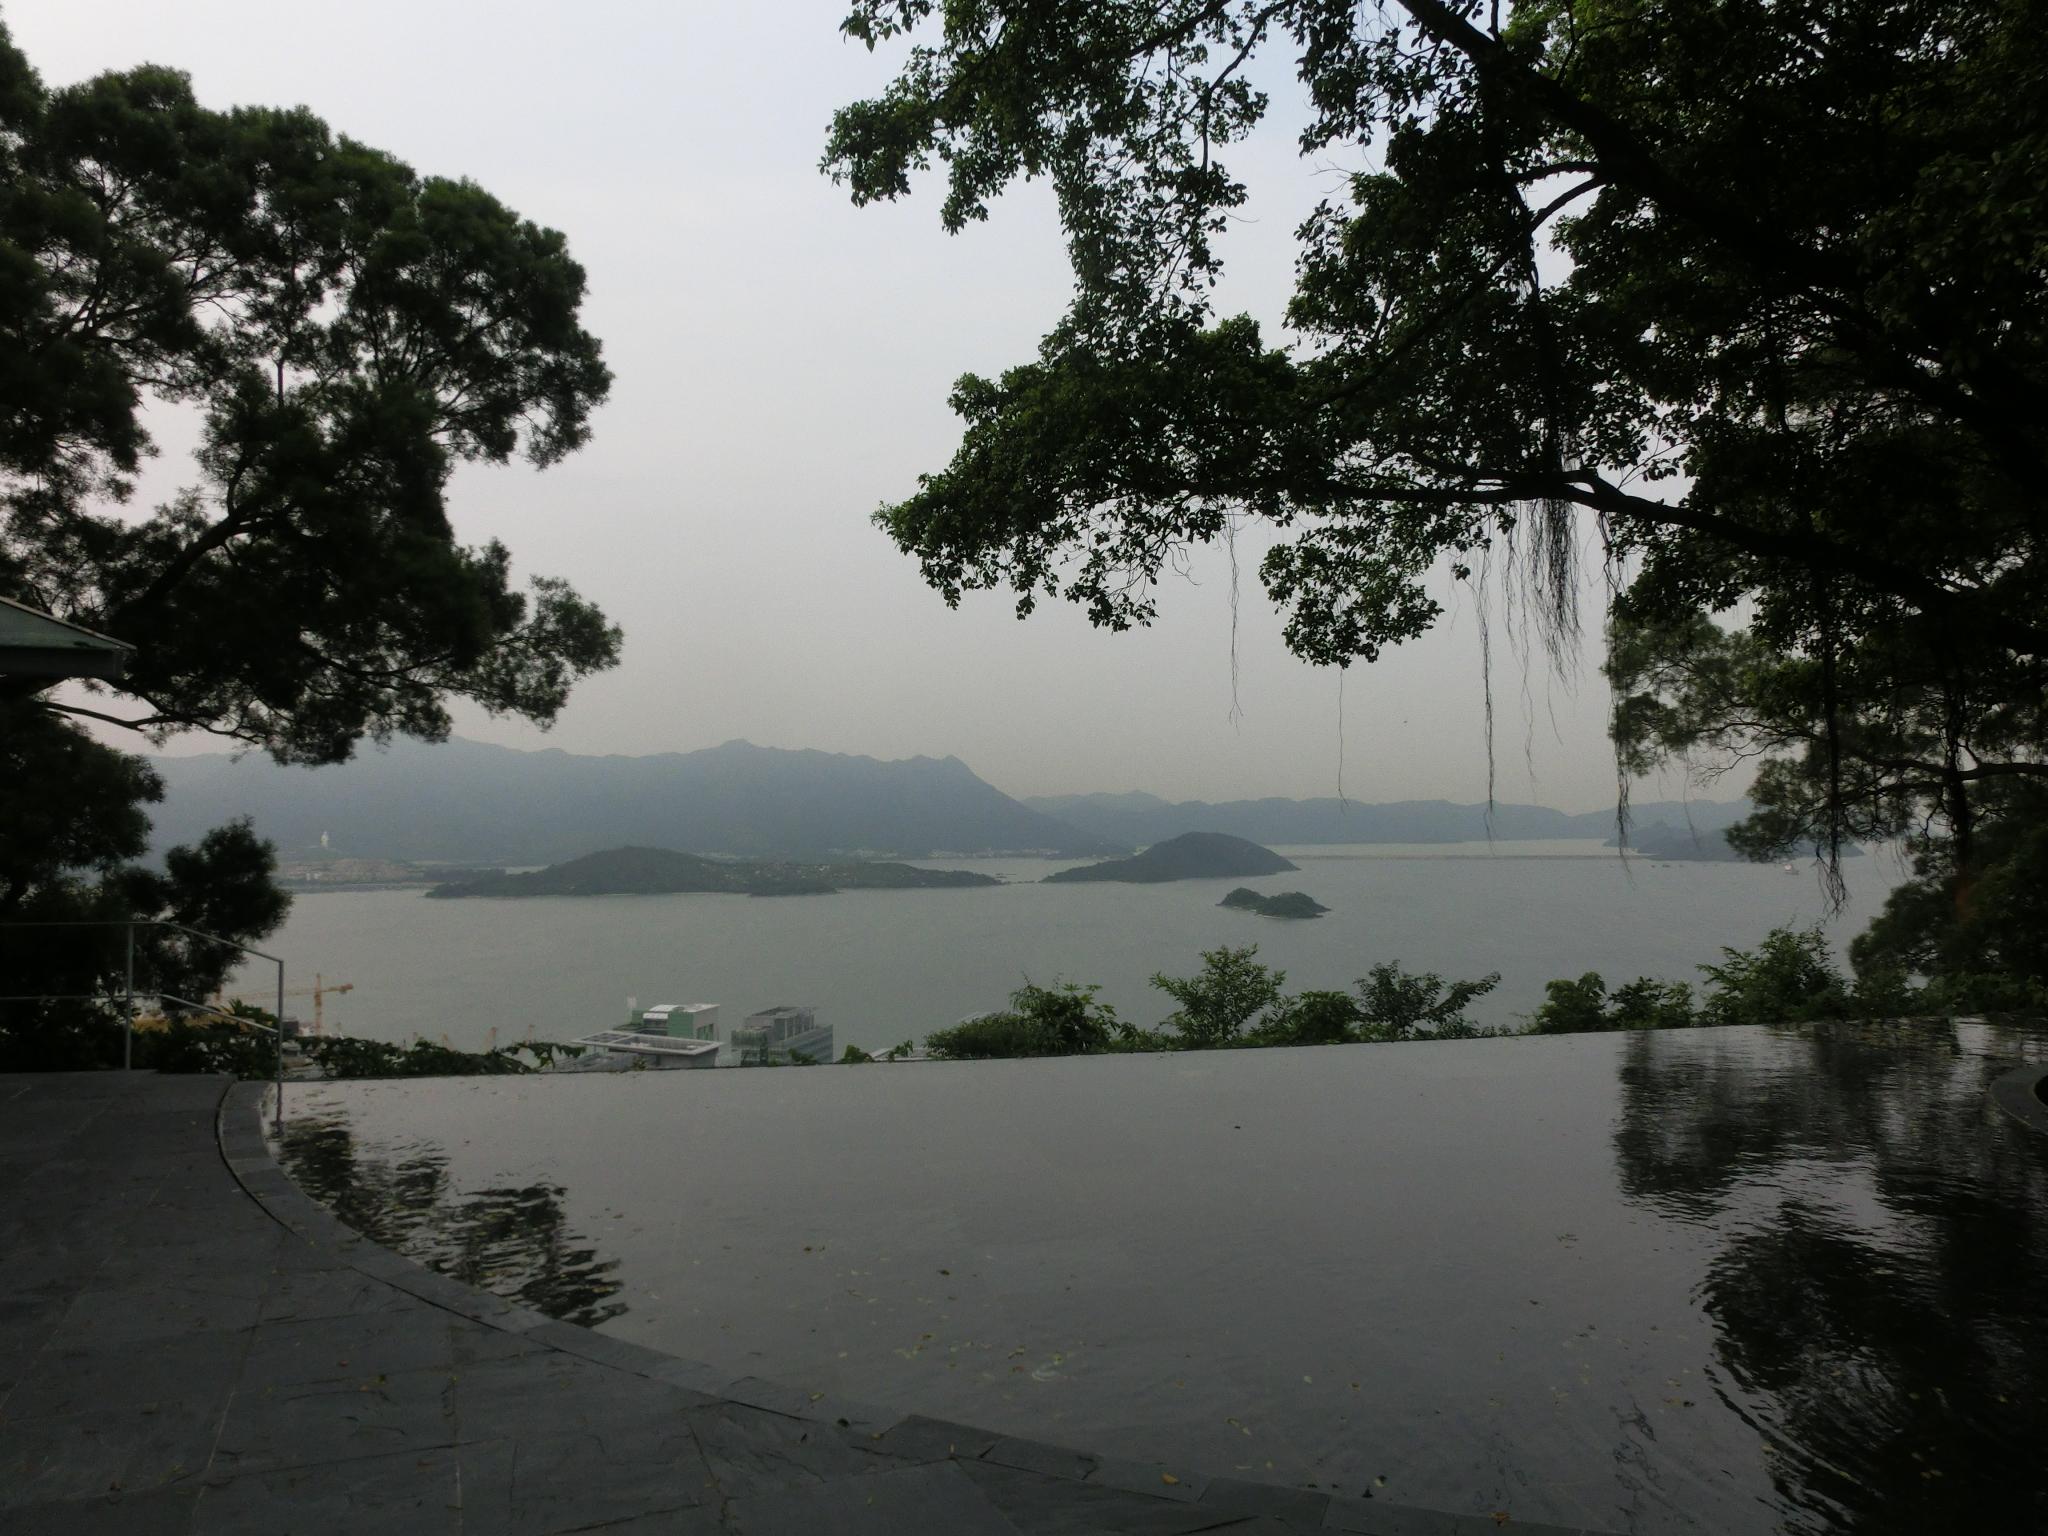 File:HK CUHK 中文大學 Tai Po 大埔 Ma Liu Shui 天人合一 Infinity edge pool New Asia College Aug 2013 ZR2 11.jpg - Wikimedia Commons